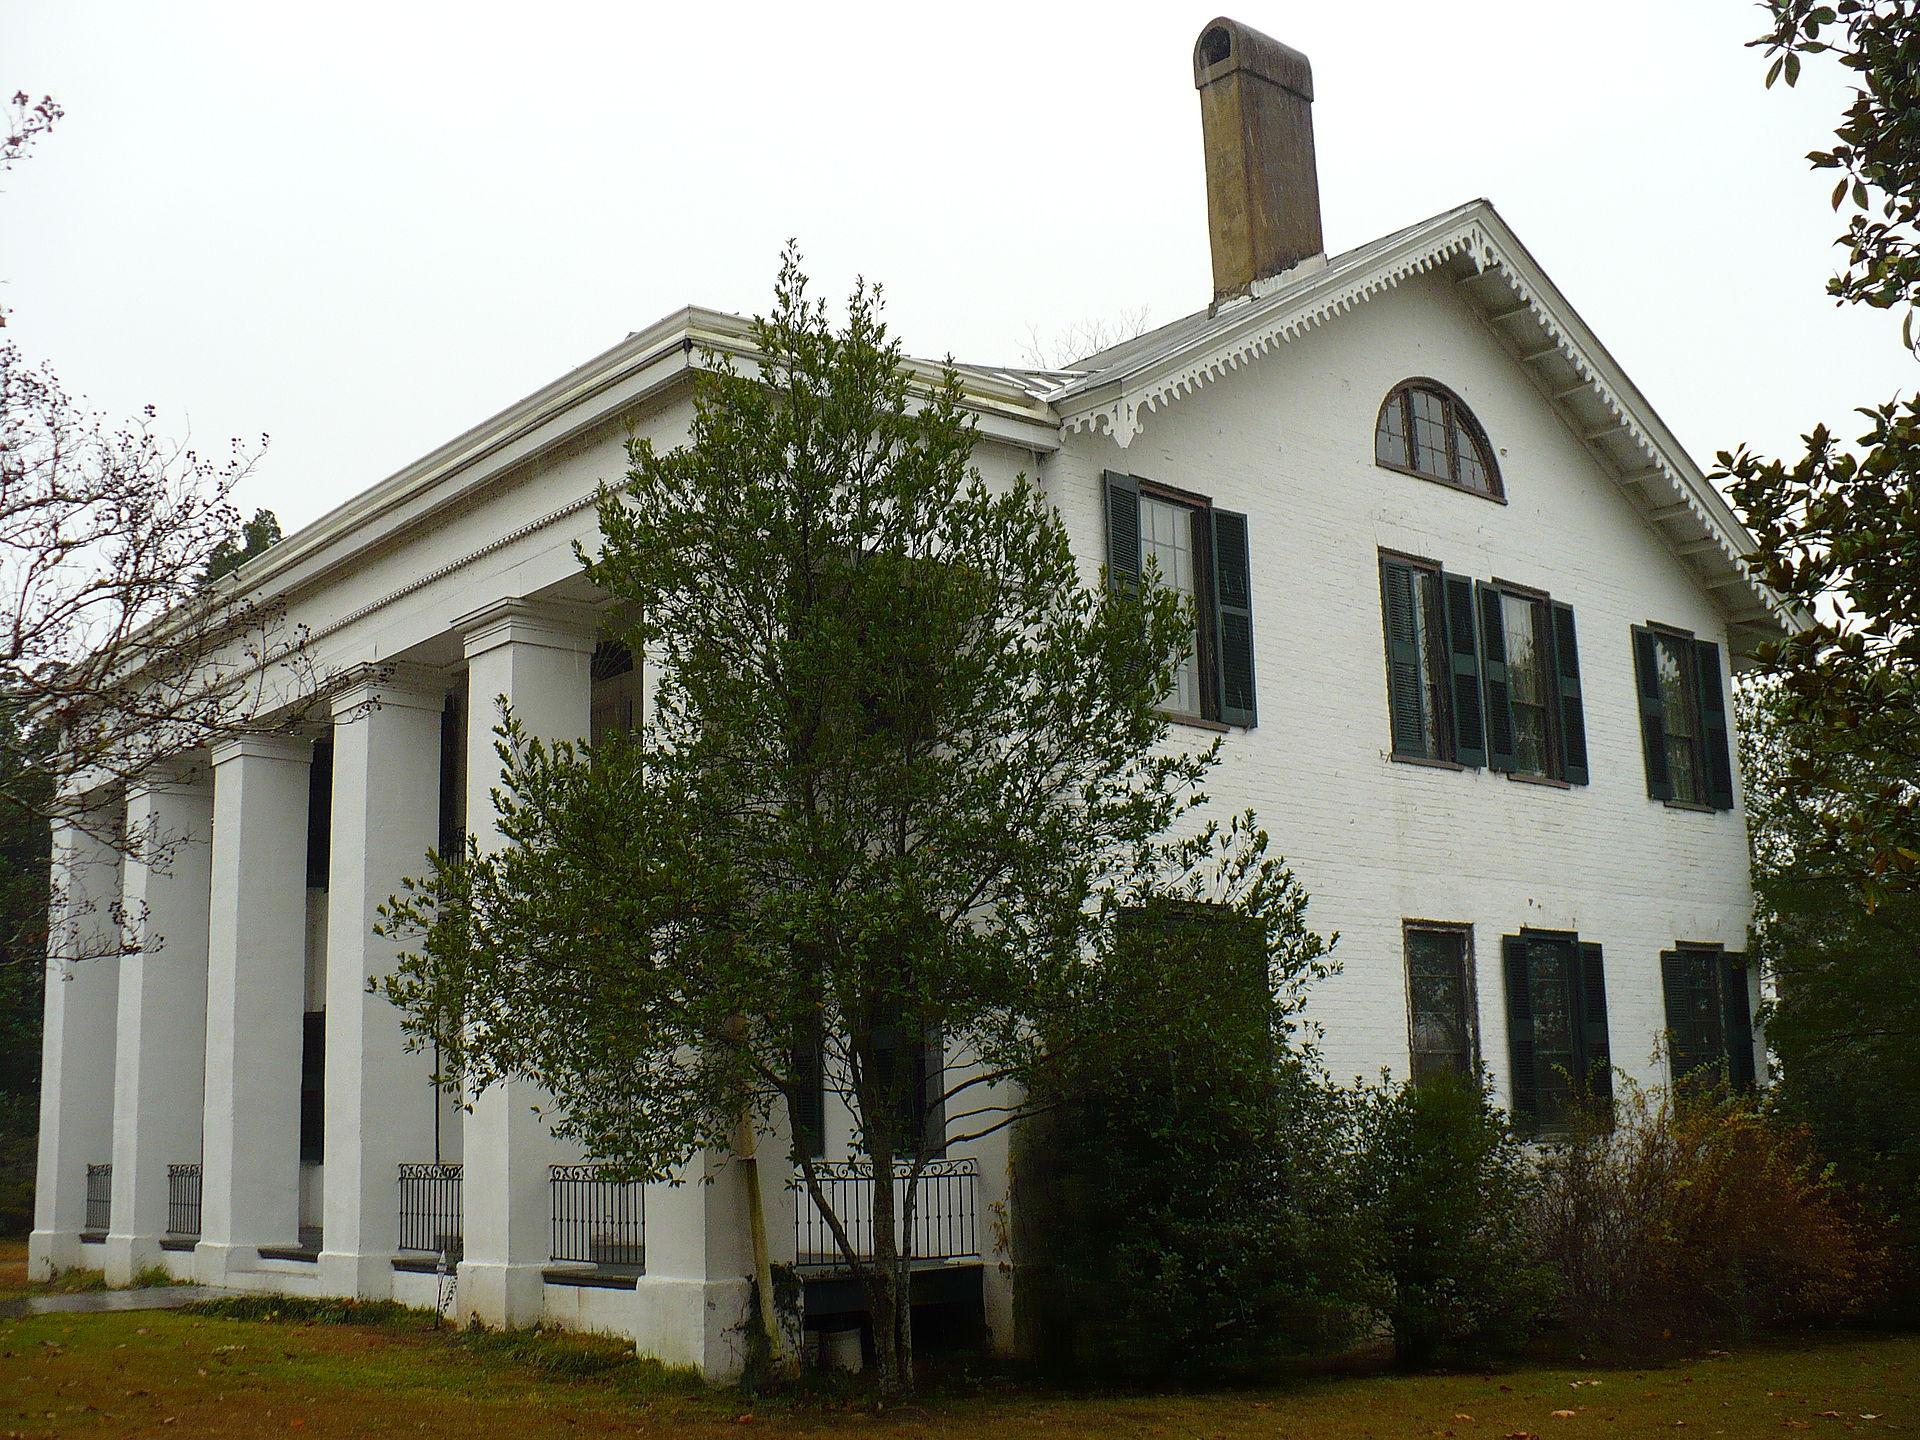 Bluff Hall